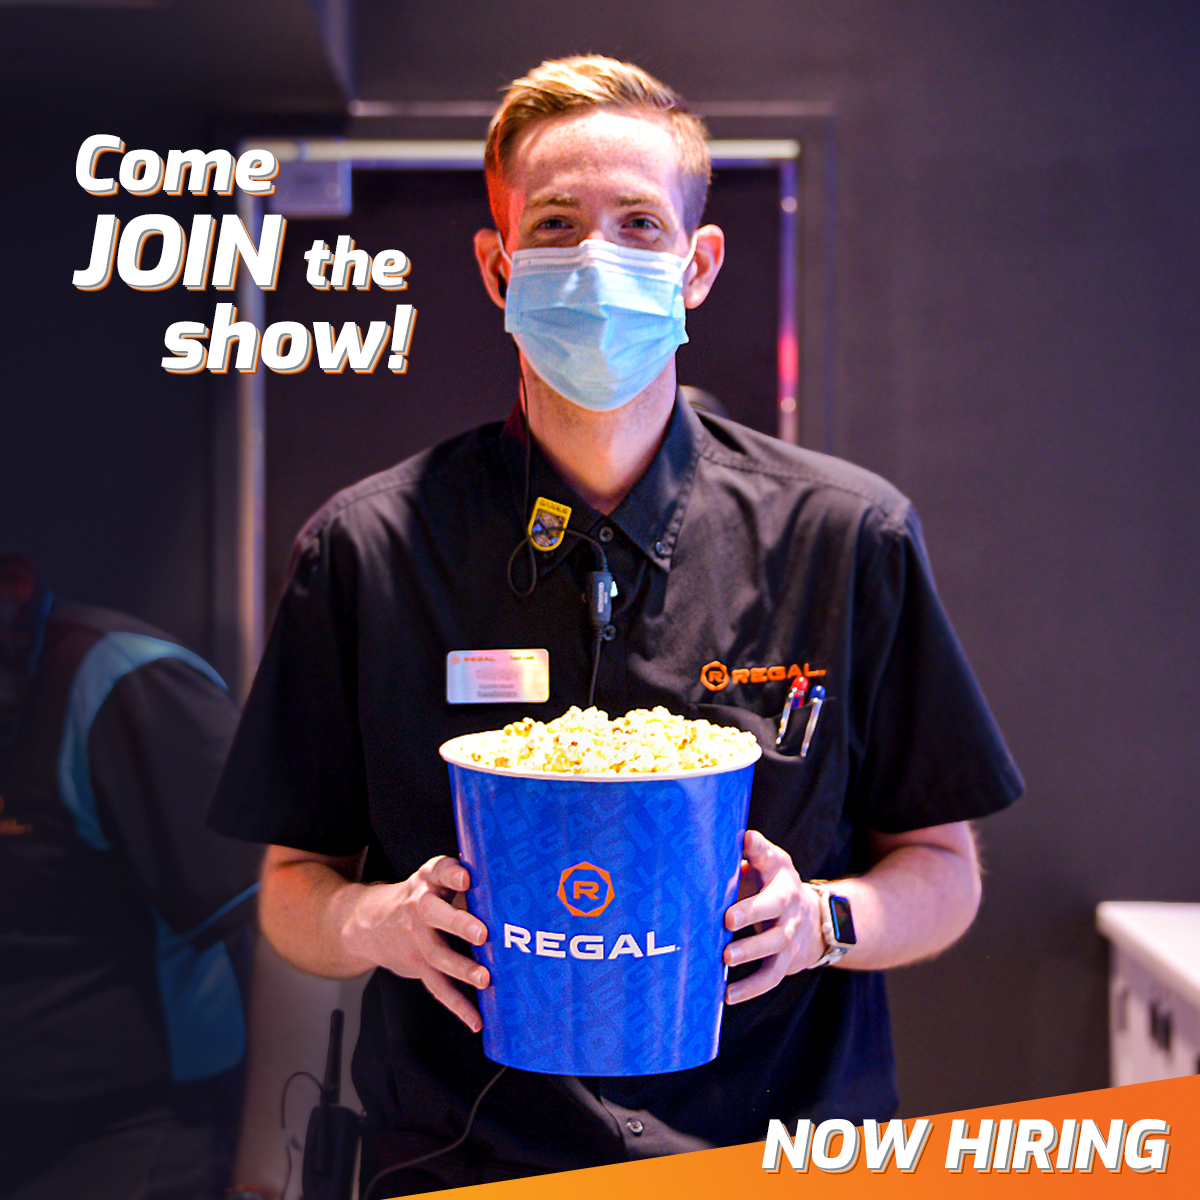 Regal Cinemas Job Fair 4/28 & 4/29